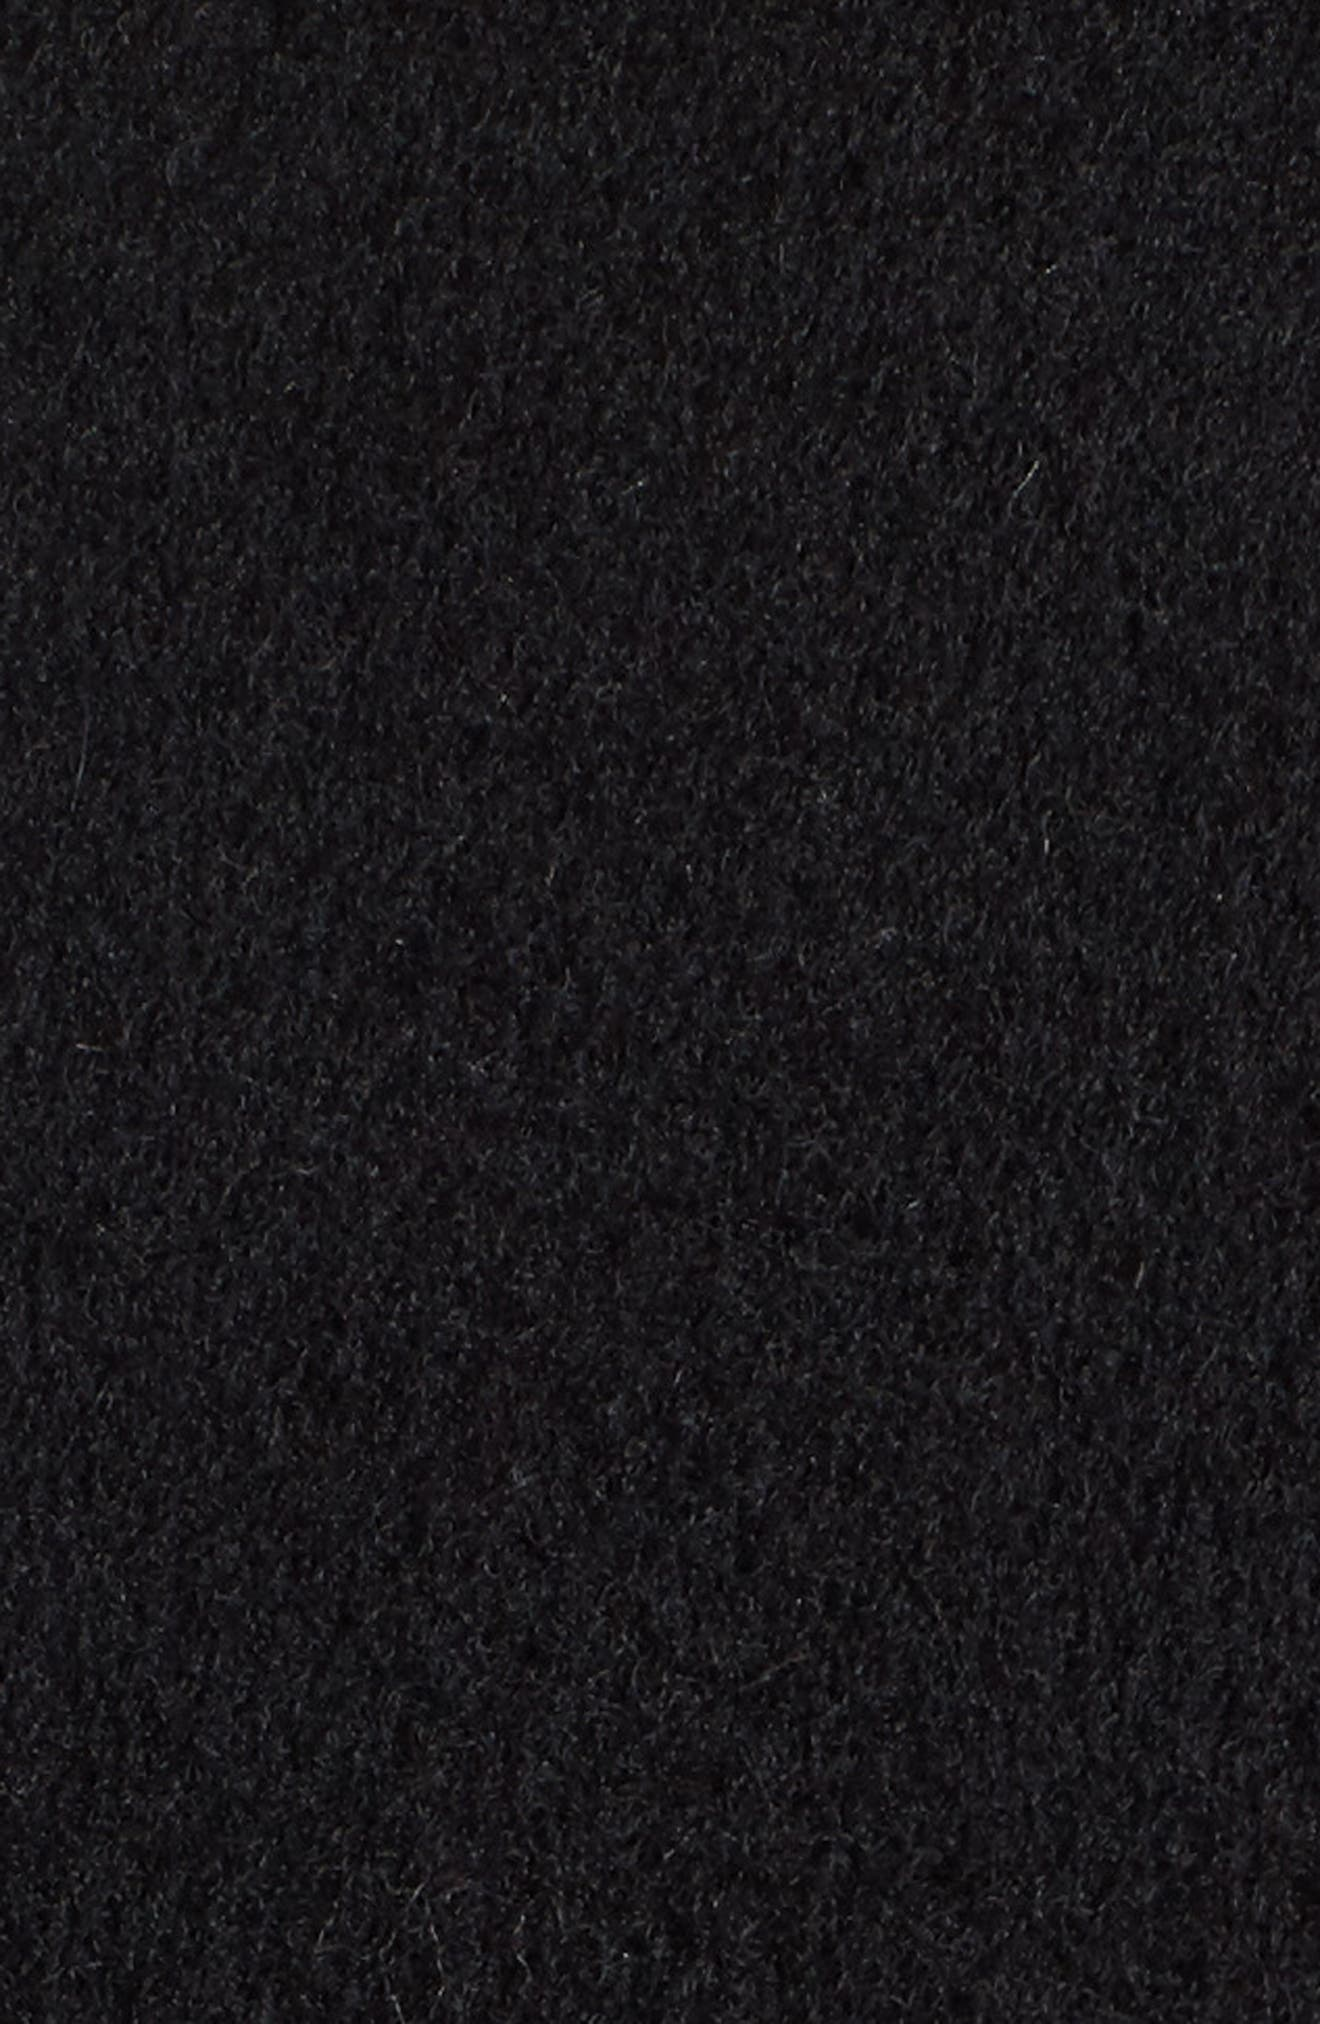 Boiled Wool Blend Wrap Coat,                             Alternate thumbnail 4, color,                             Black